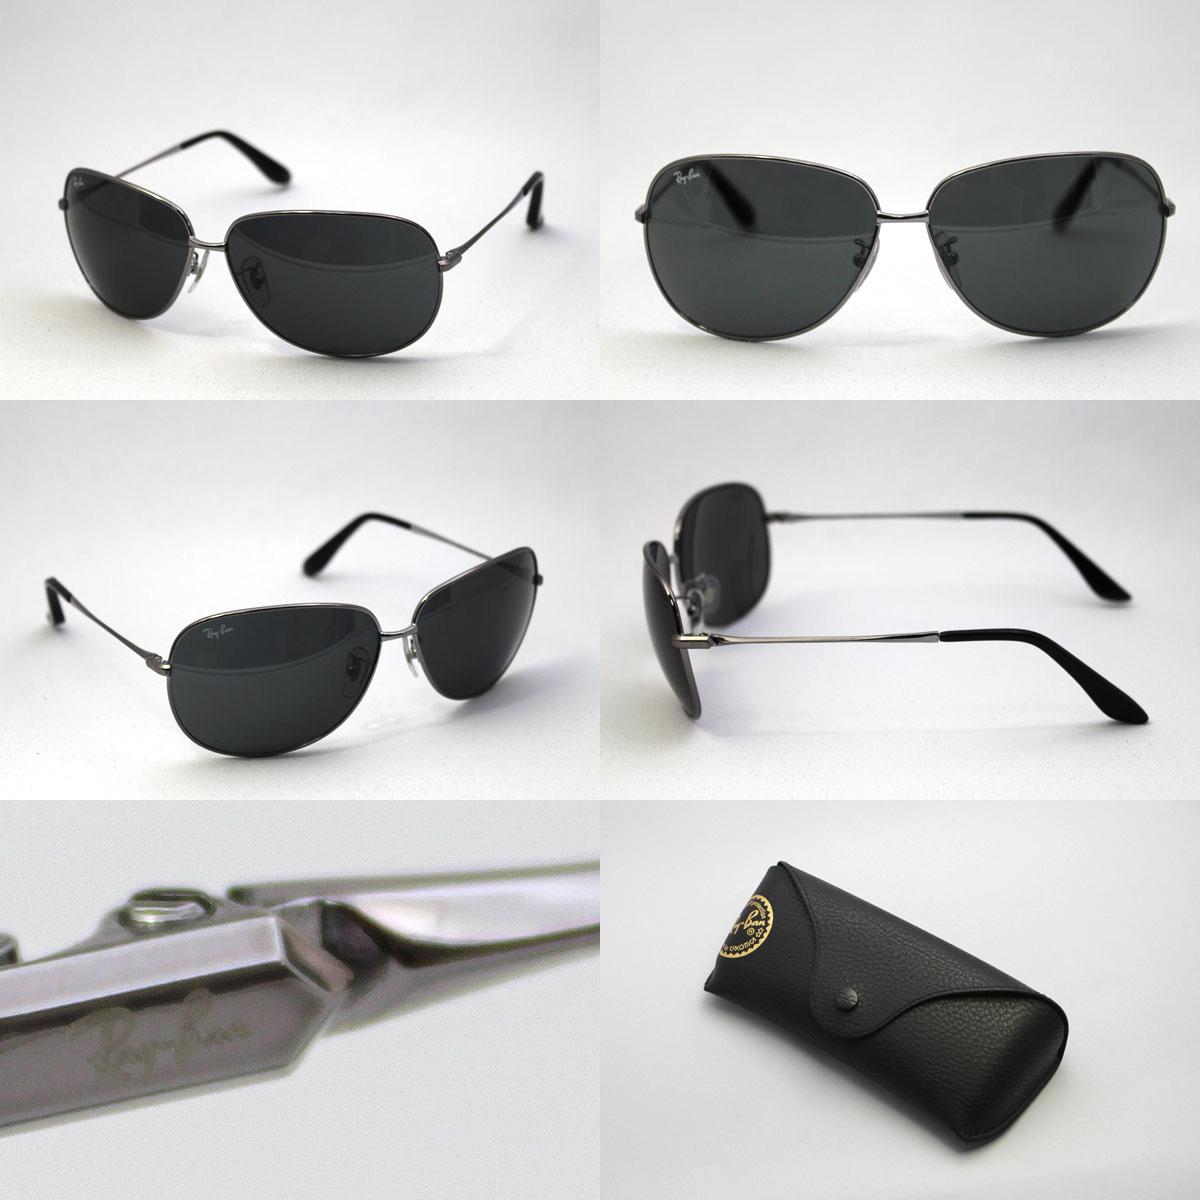 RB3451 00487 RayBan Ray Ban sunglasses Japan model NEW ARRIVAL glassmania